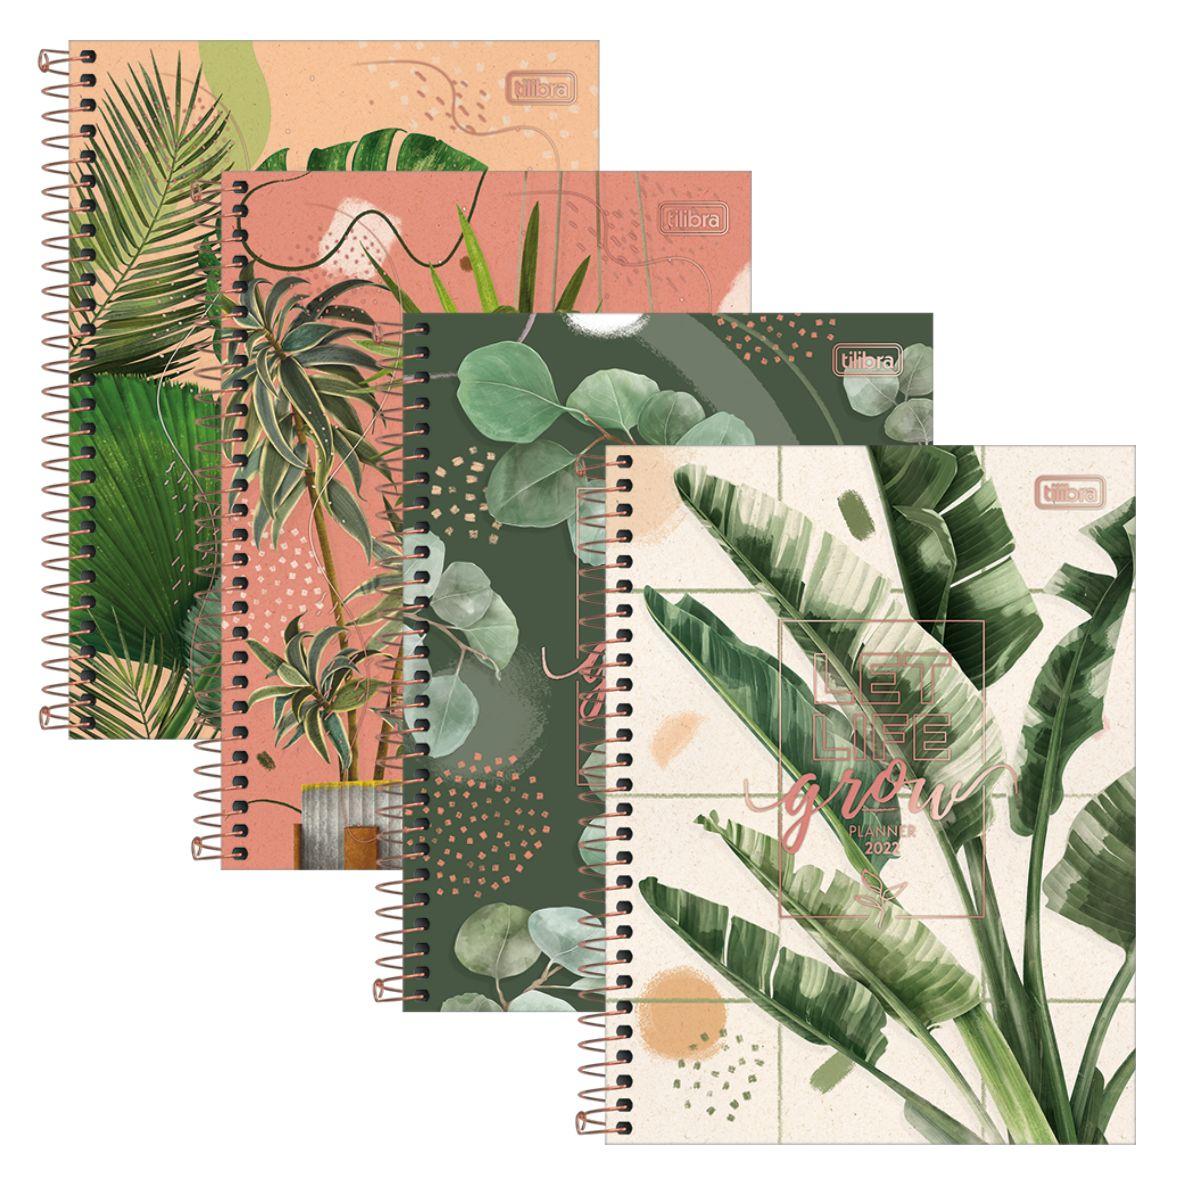 Agenda Planner Naturalis 2022 Nature - Tilibra